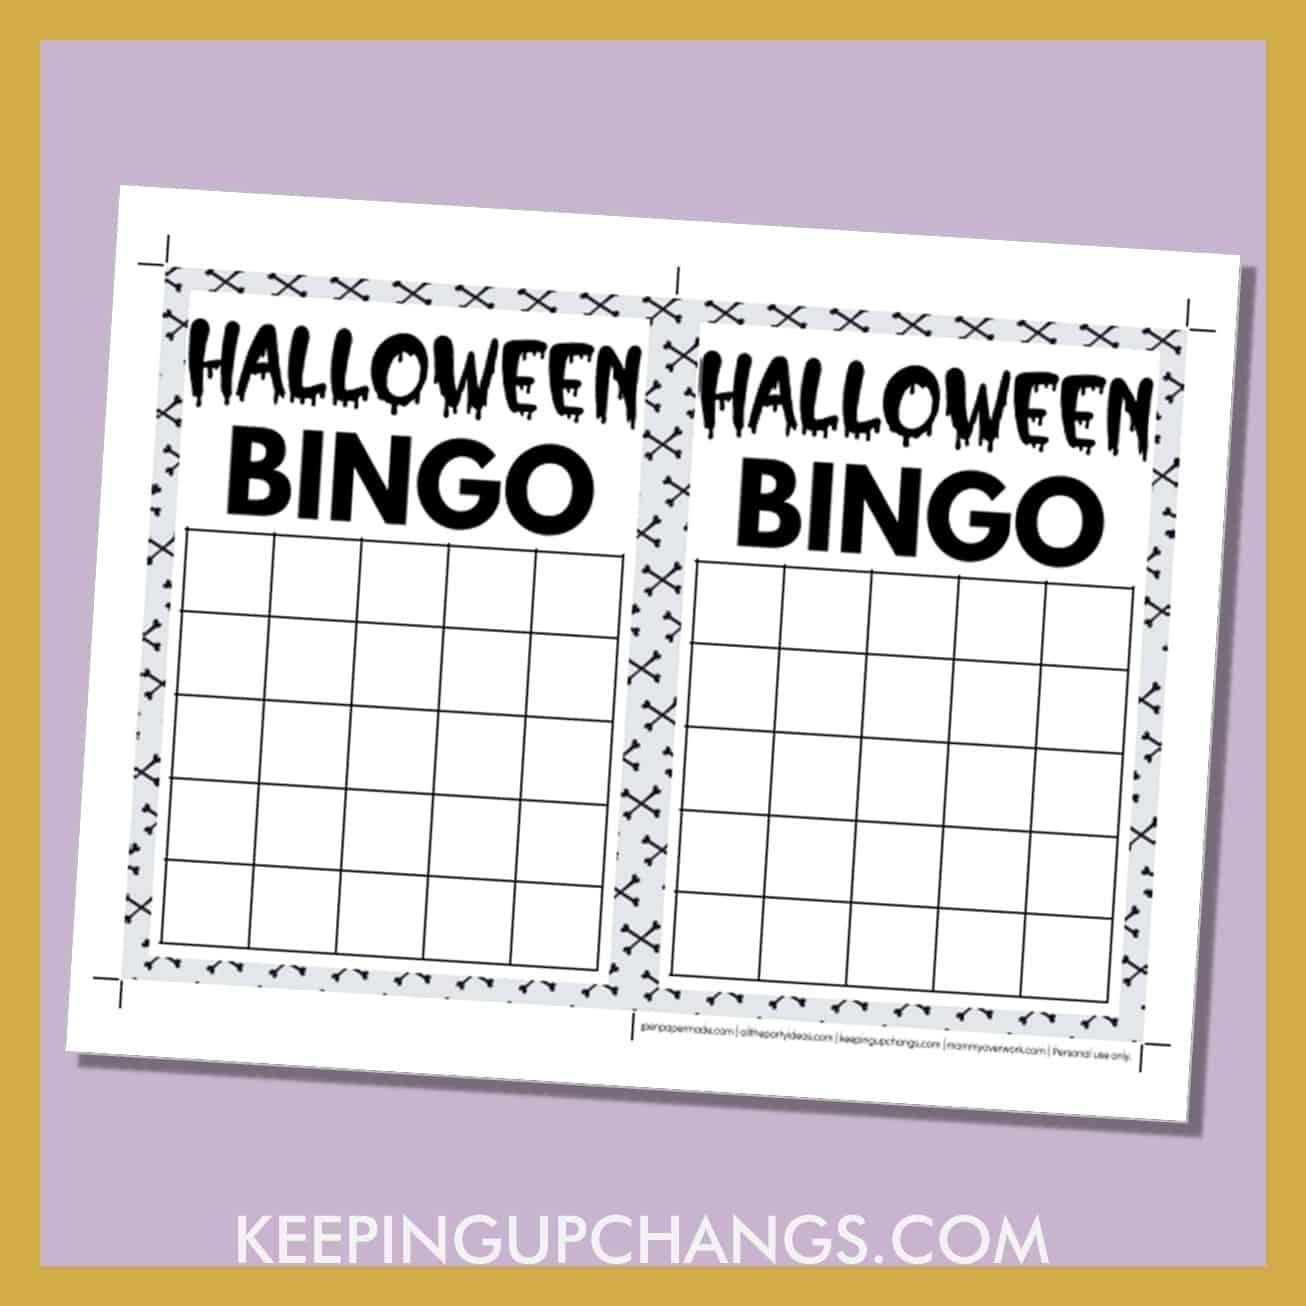 free halloween bingo 5x5 grid black white game board blank template.